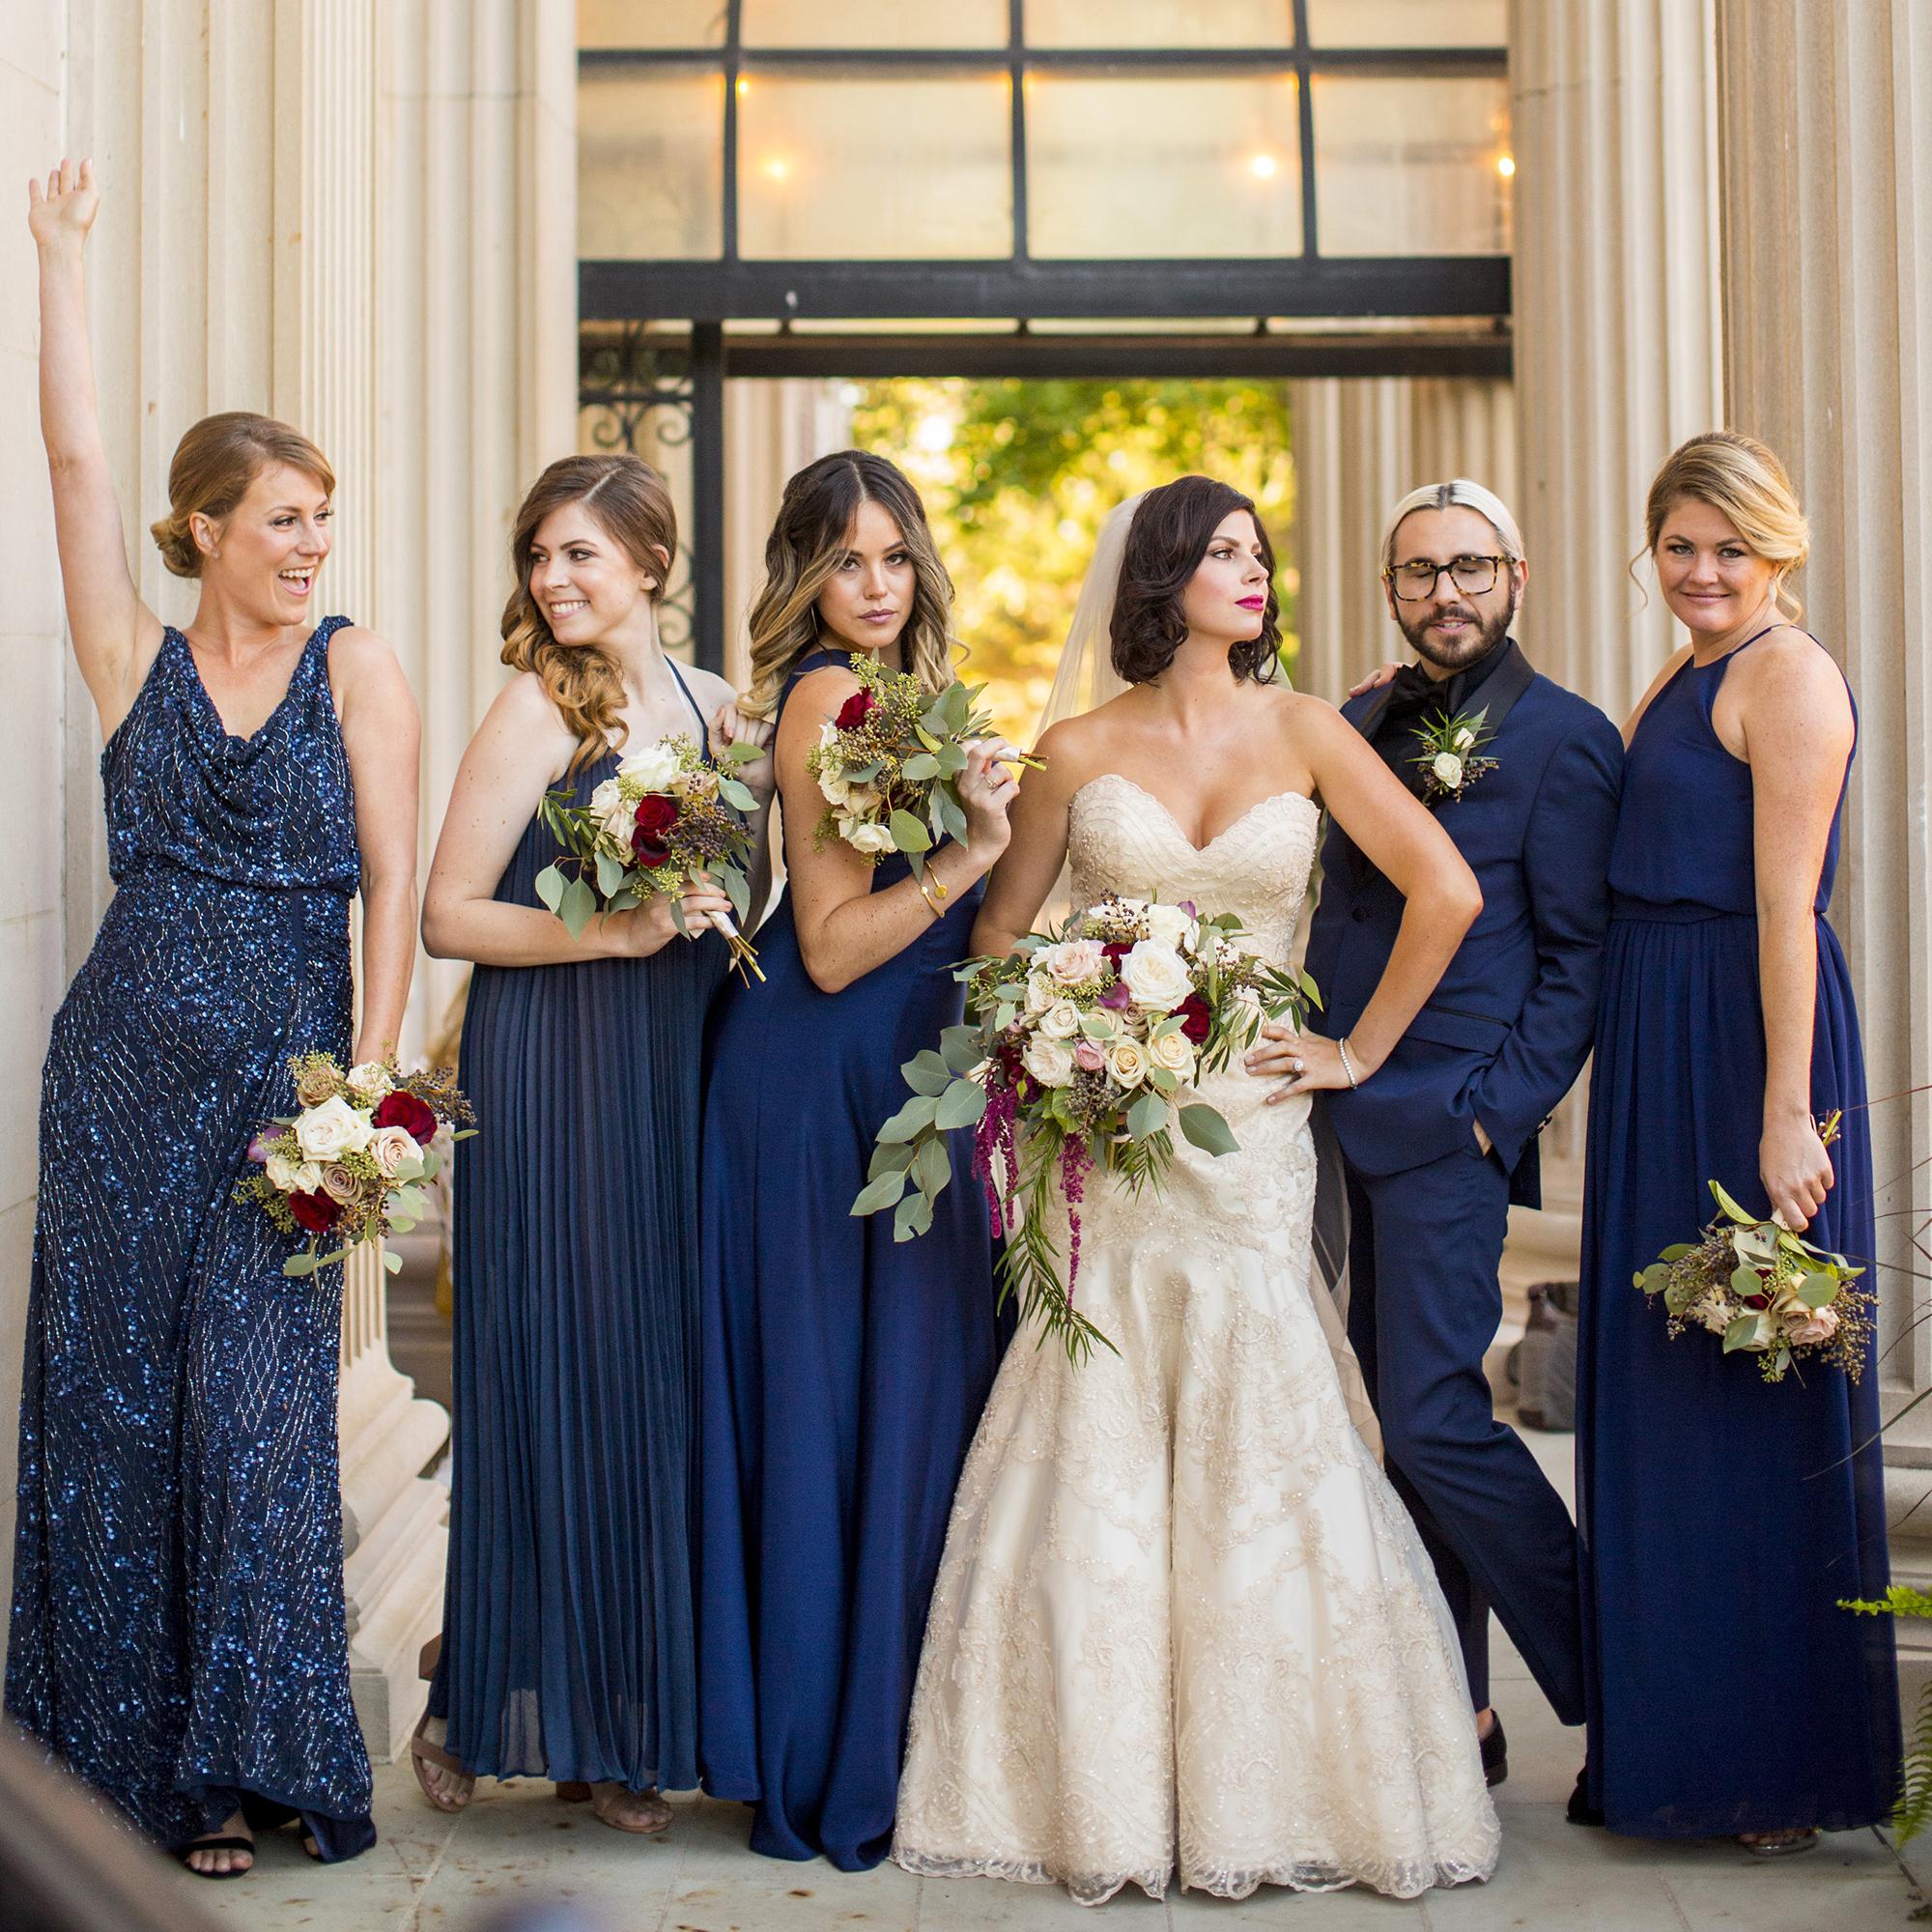 Seriously_Sabrina_Photography_Lexington_Kentucky_Wedding_Photographer_Boone874.jpg